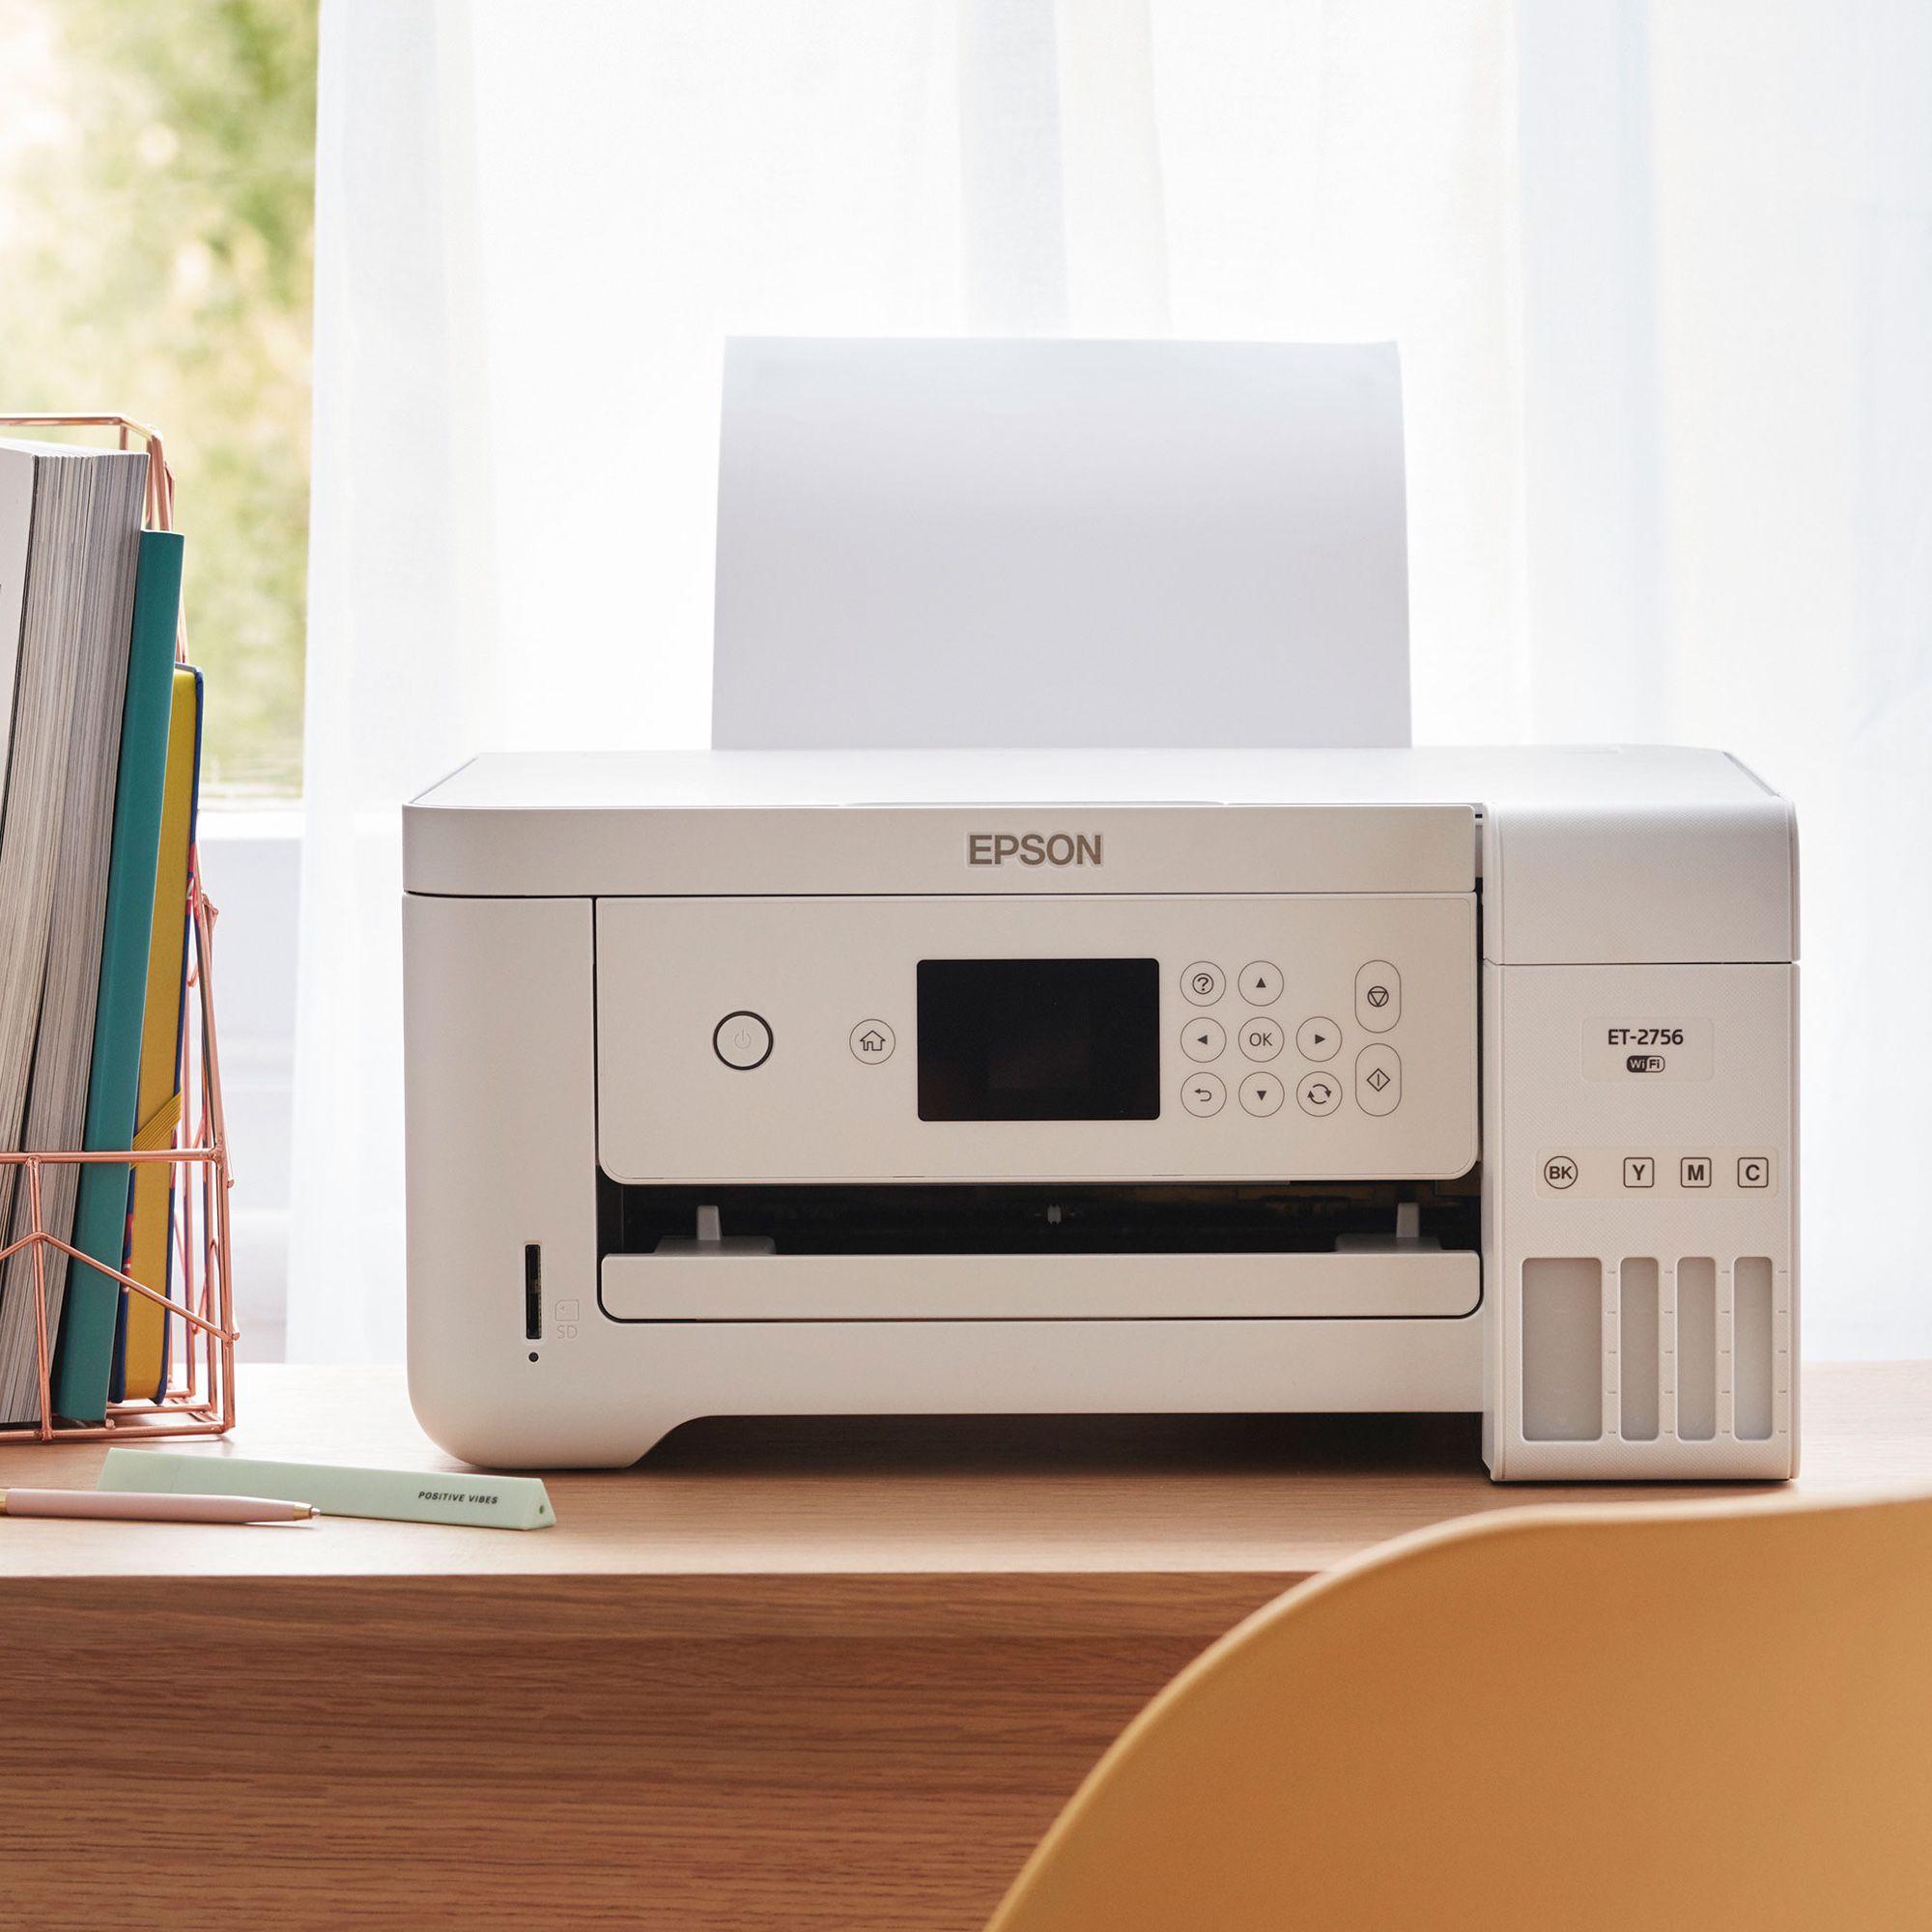 Printers | Wireless Printer, Photo Printer, Ink Cartridge